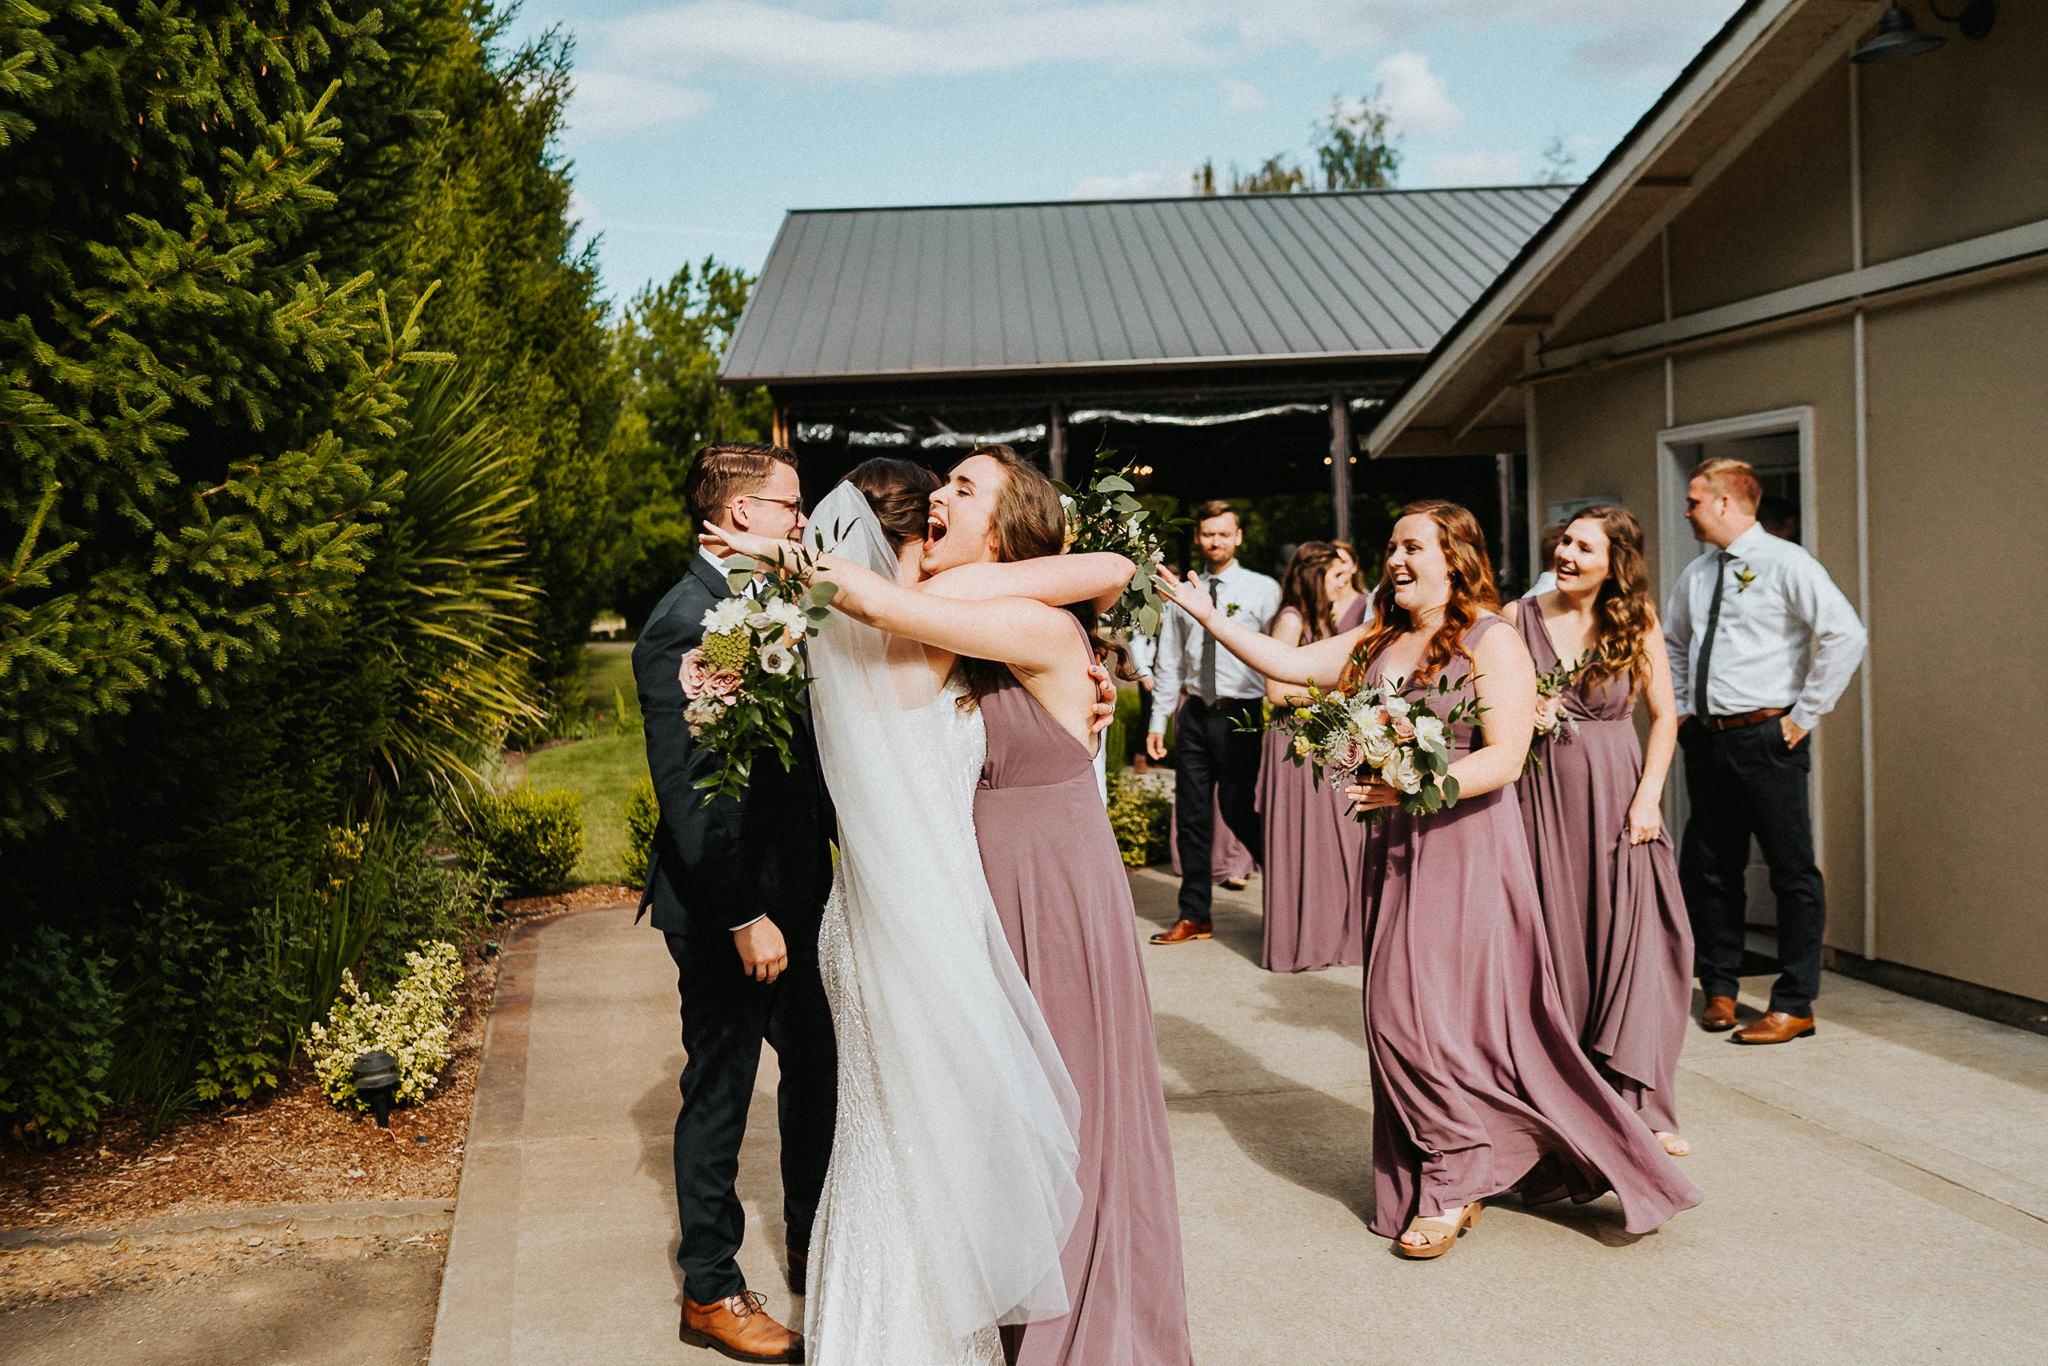 Celebrate wedding party hugs bridesmaid Wedding Photography